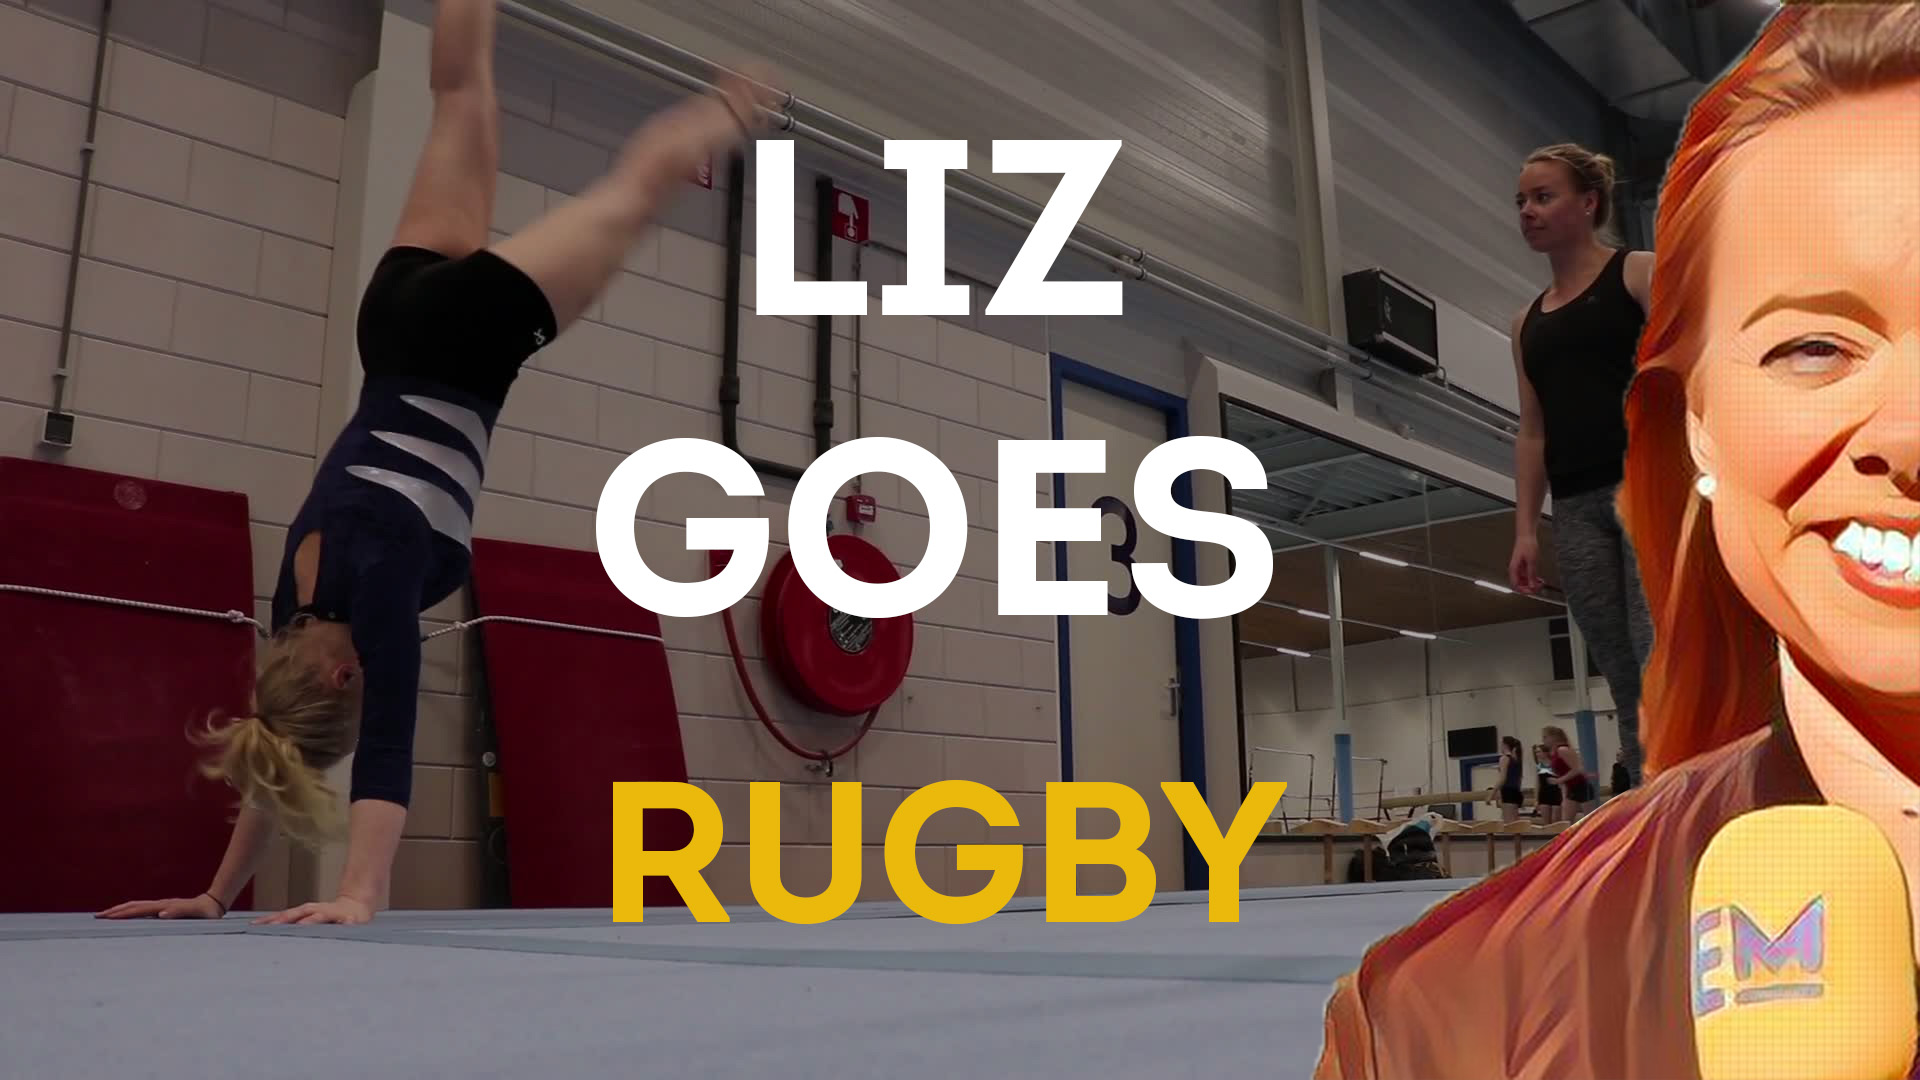 liz goes rugby